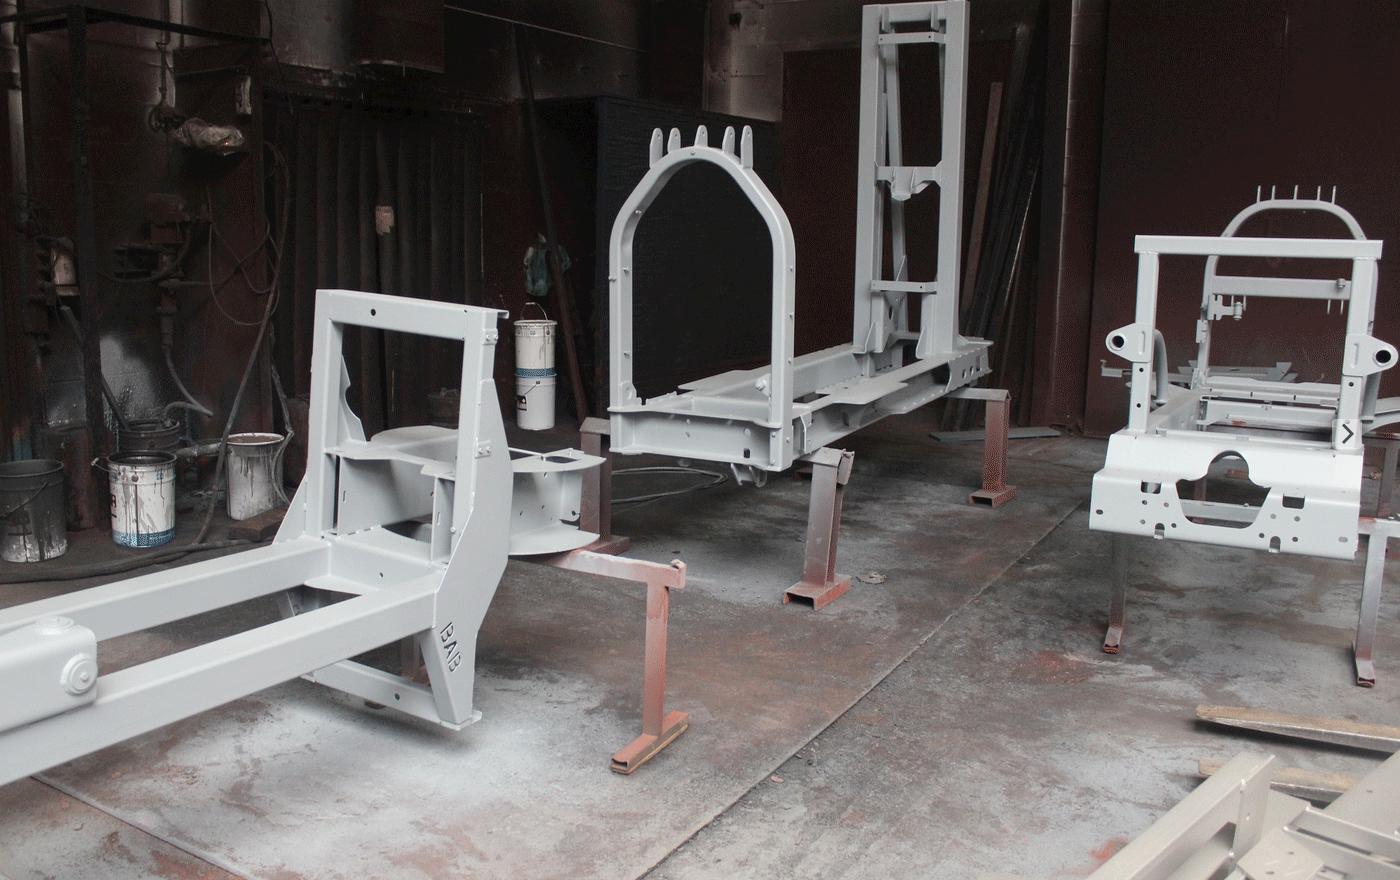 Spuitmachine